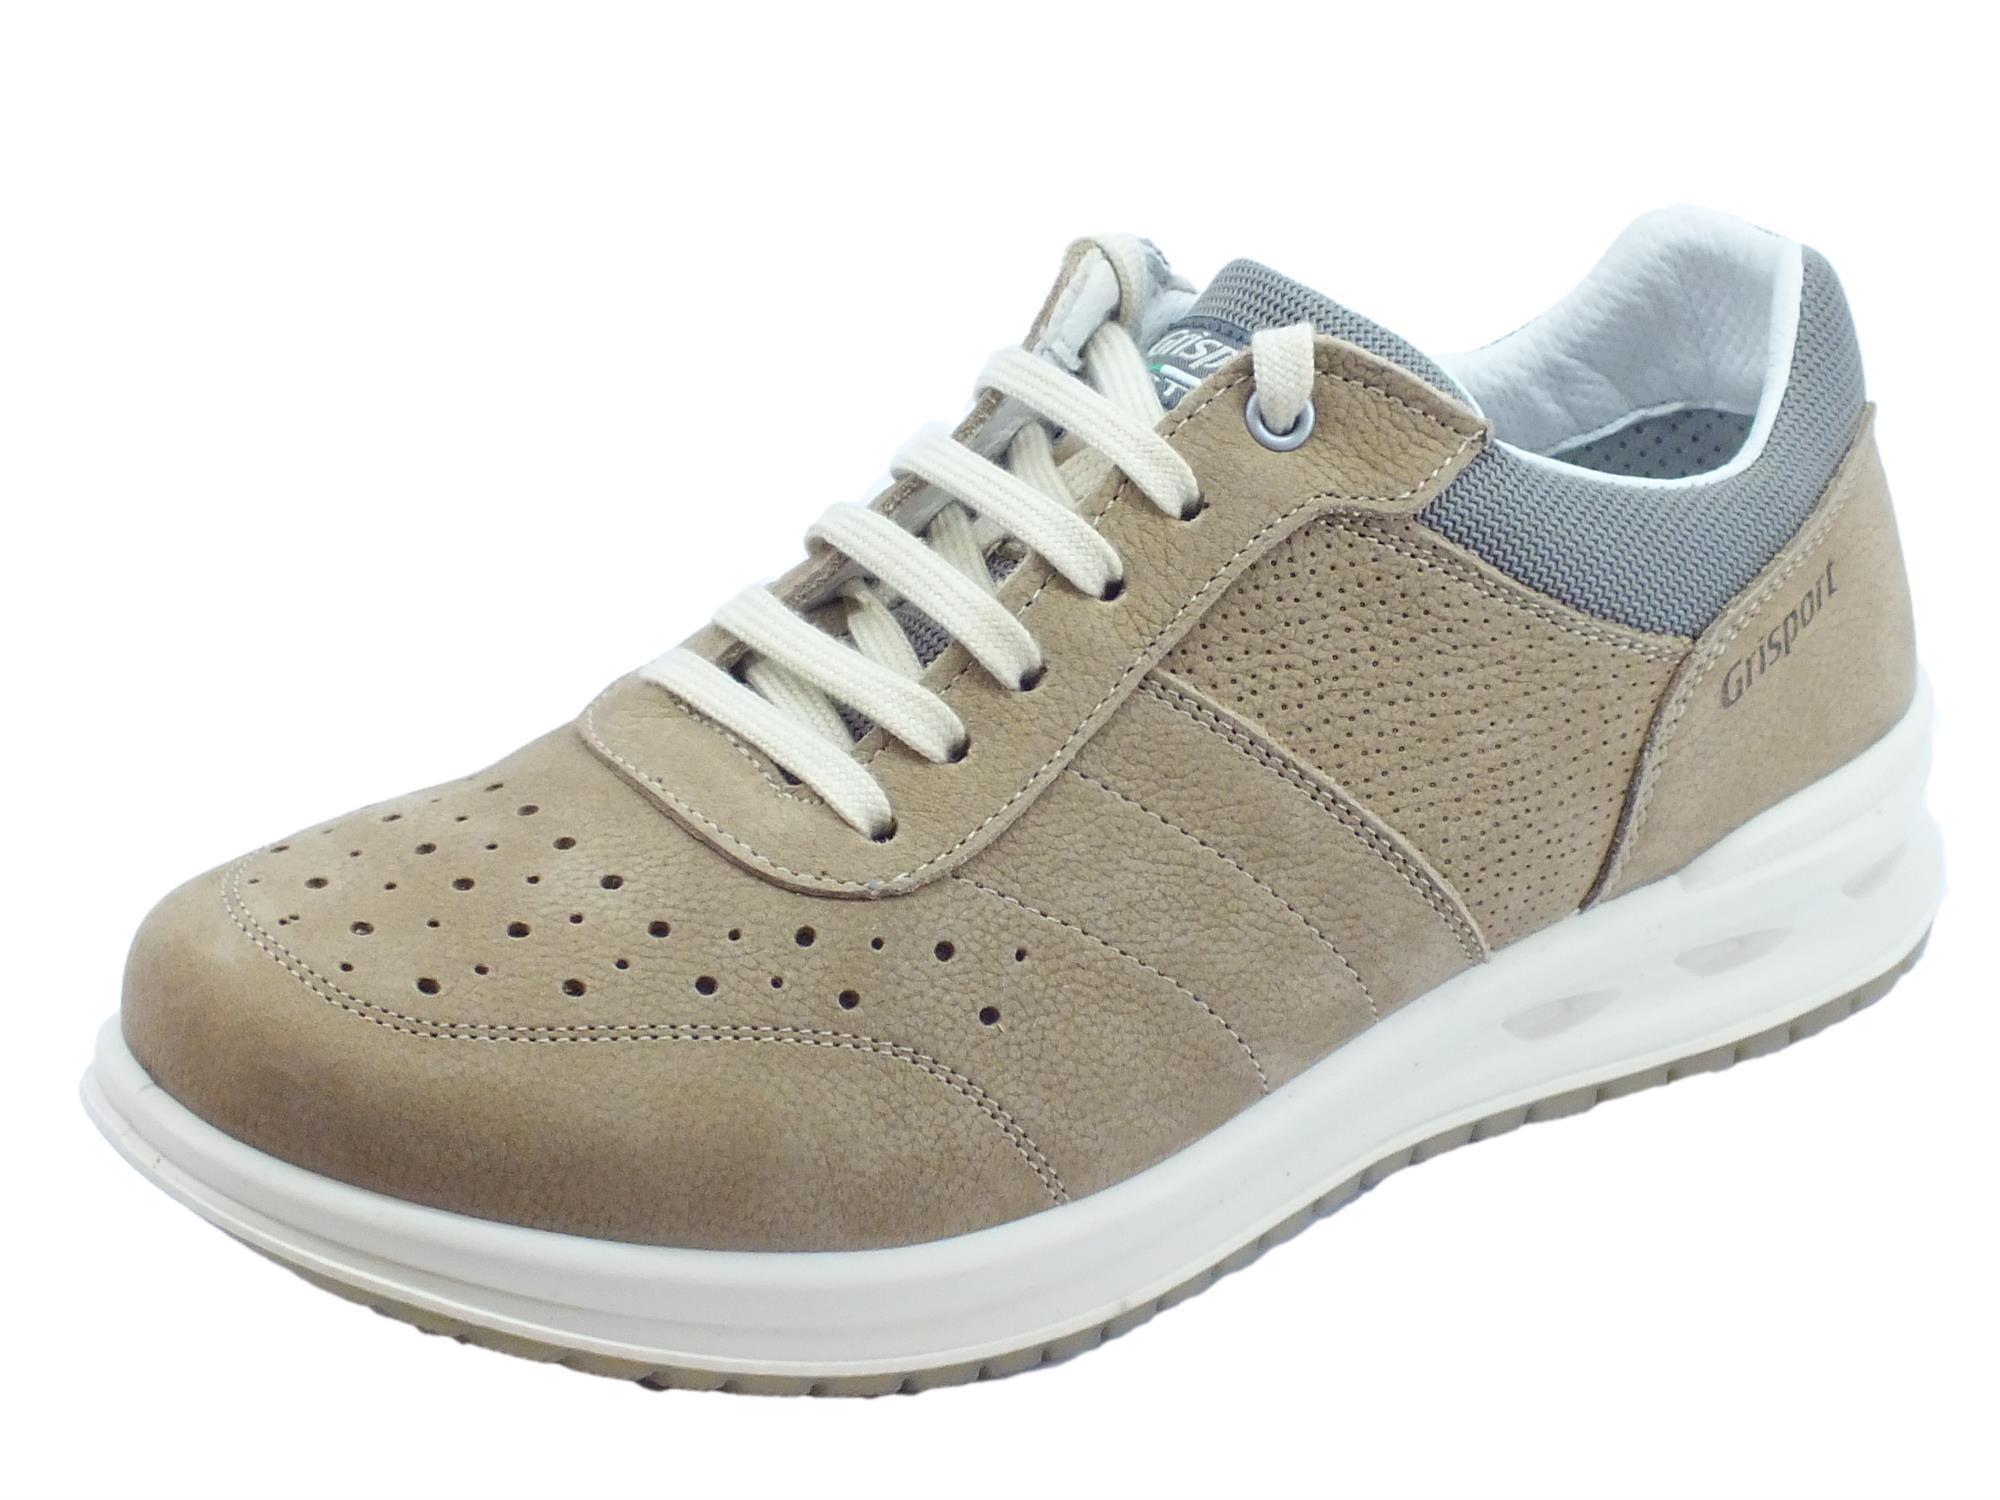 info for 29634 08715 Grisport 43055C6 Sabbia Cangù Stampato scarpe uomo in nabuk taupe  antistatica